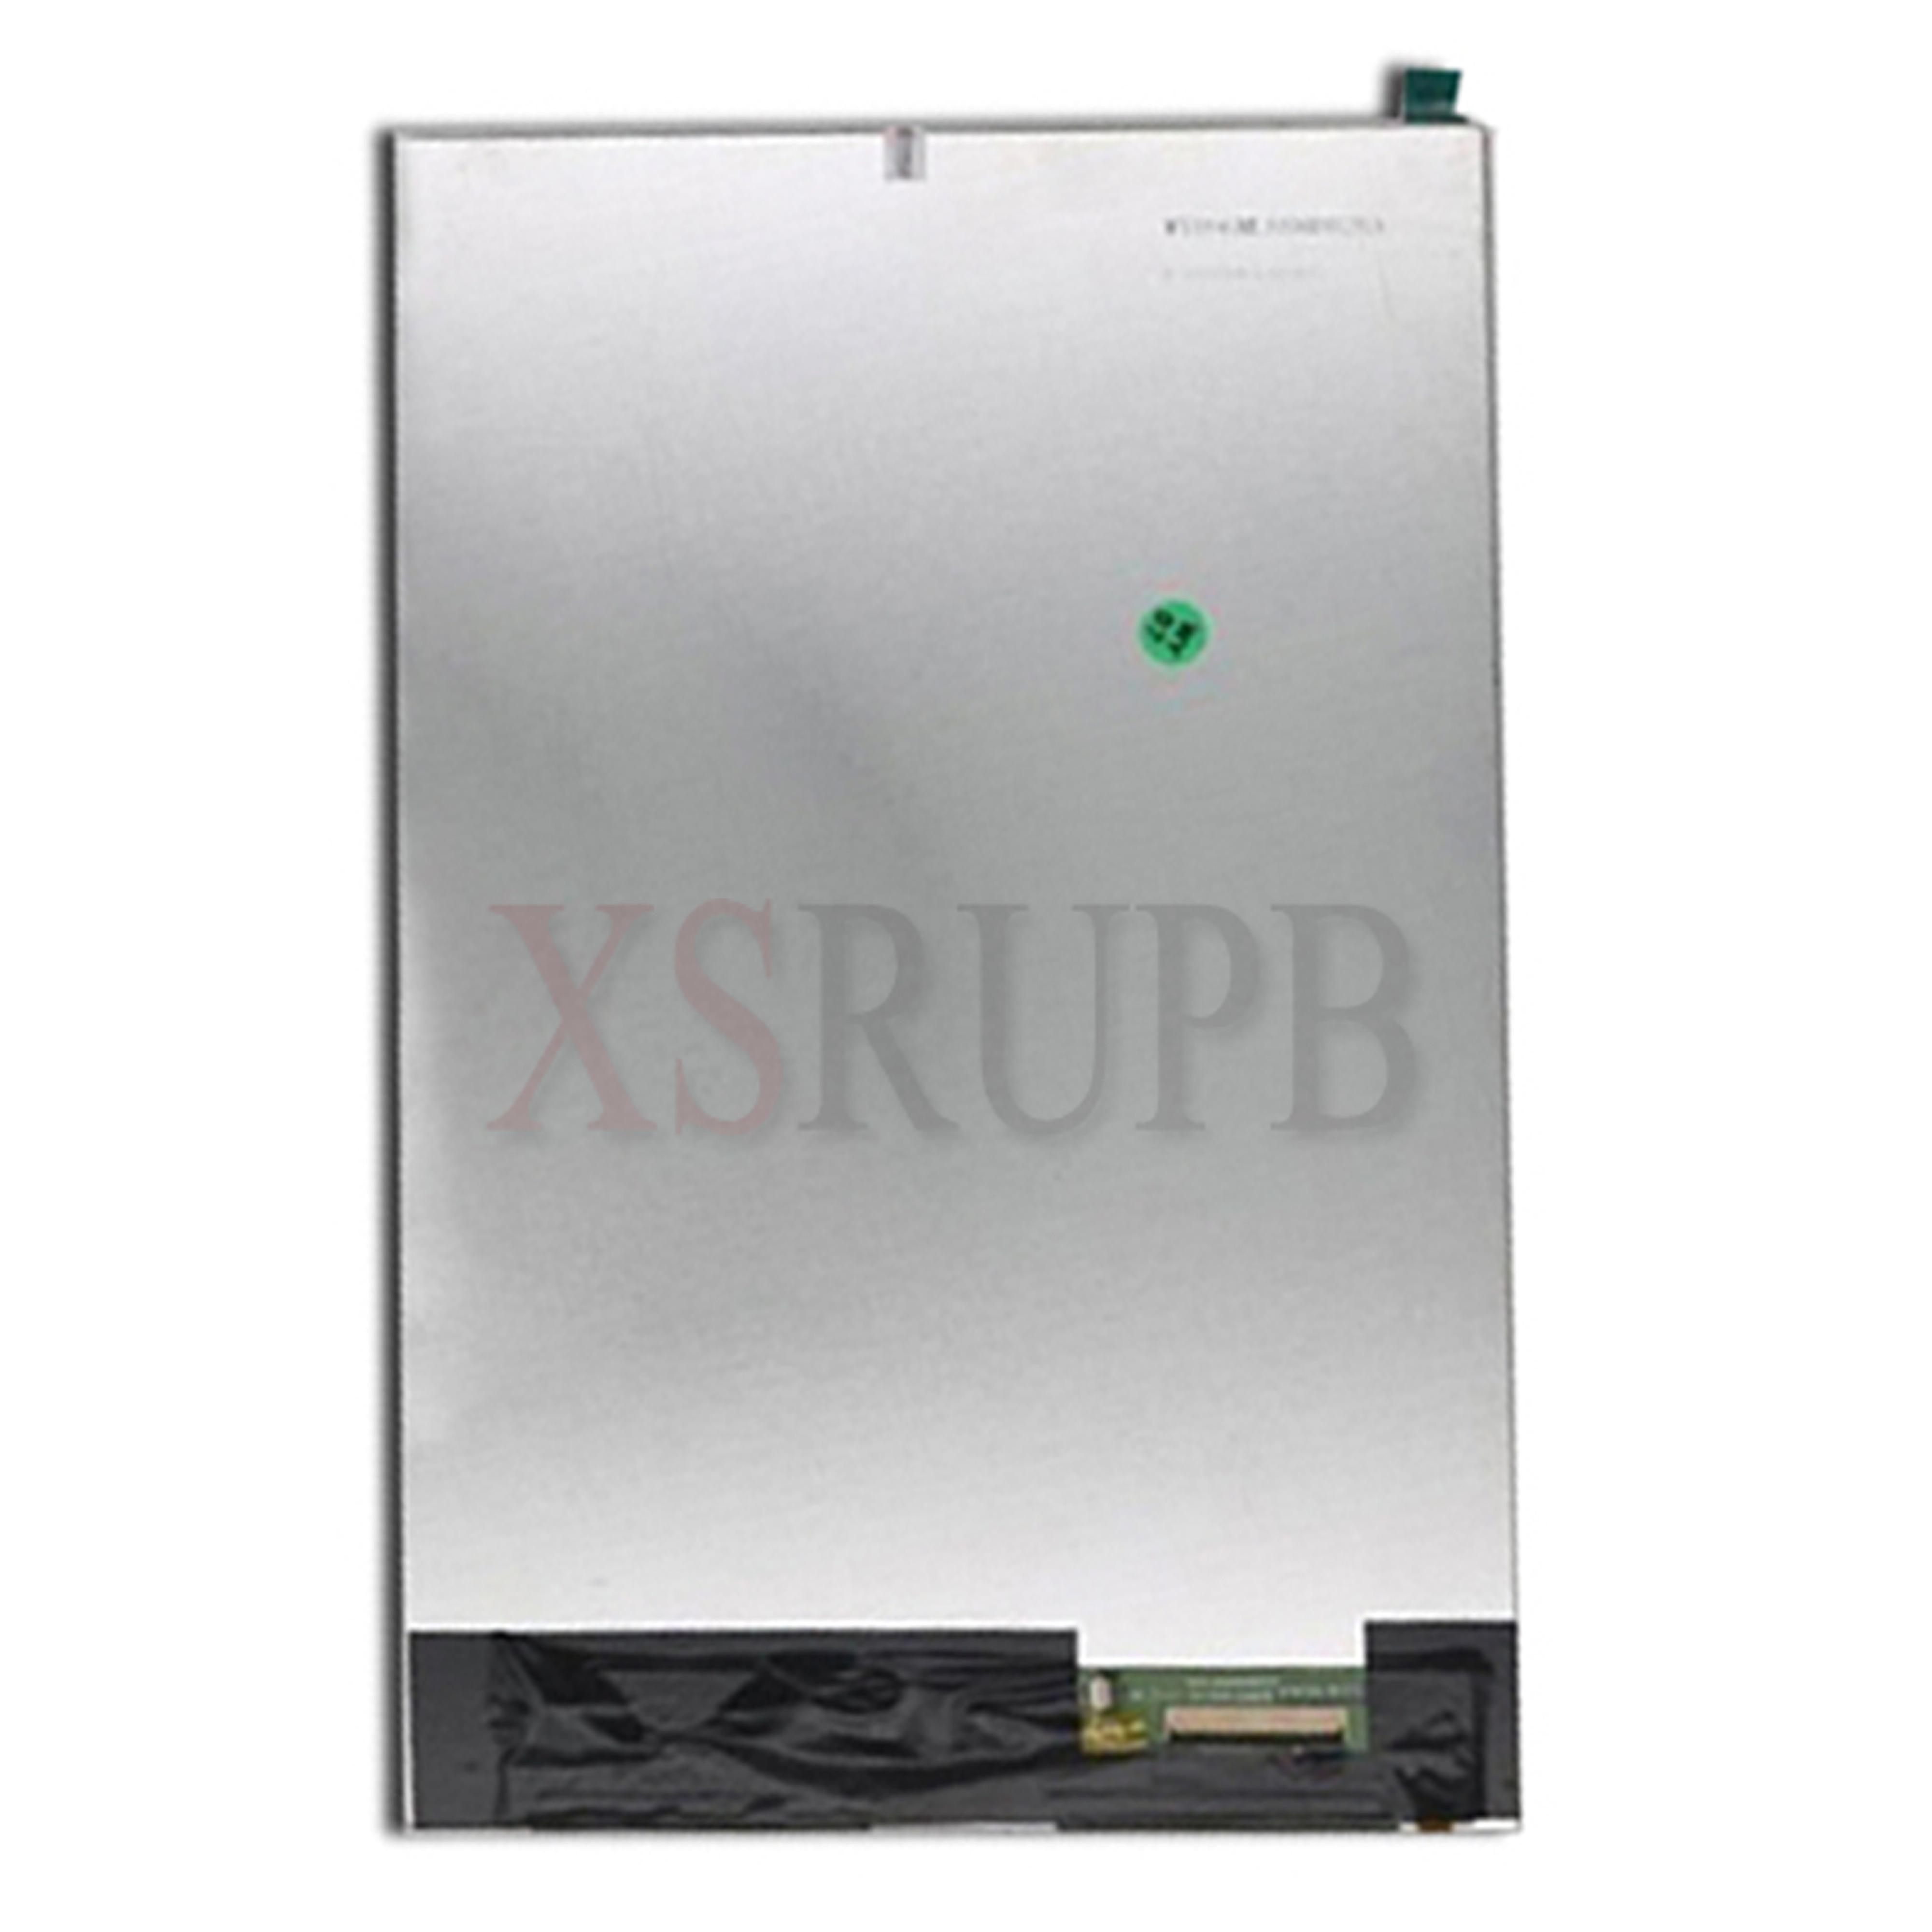 Original 9.6 inch LCD display BP096WX7-100 E2C0C4028E0 E150630 94V-0 For 1280*800 LCD Display screen Free shipping 10 bp096wx1 100 bp096wx7 100